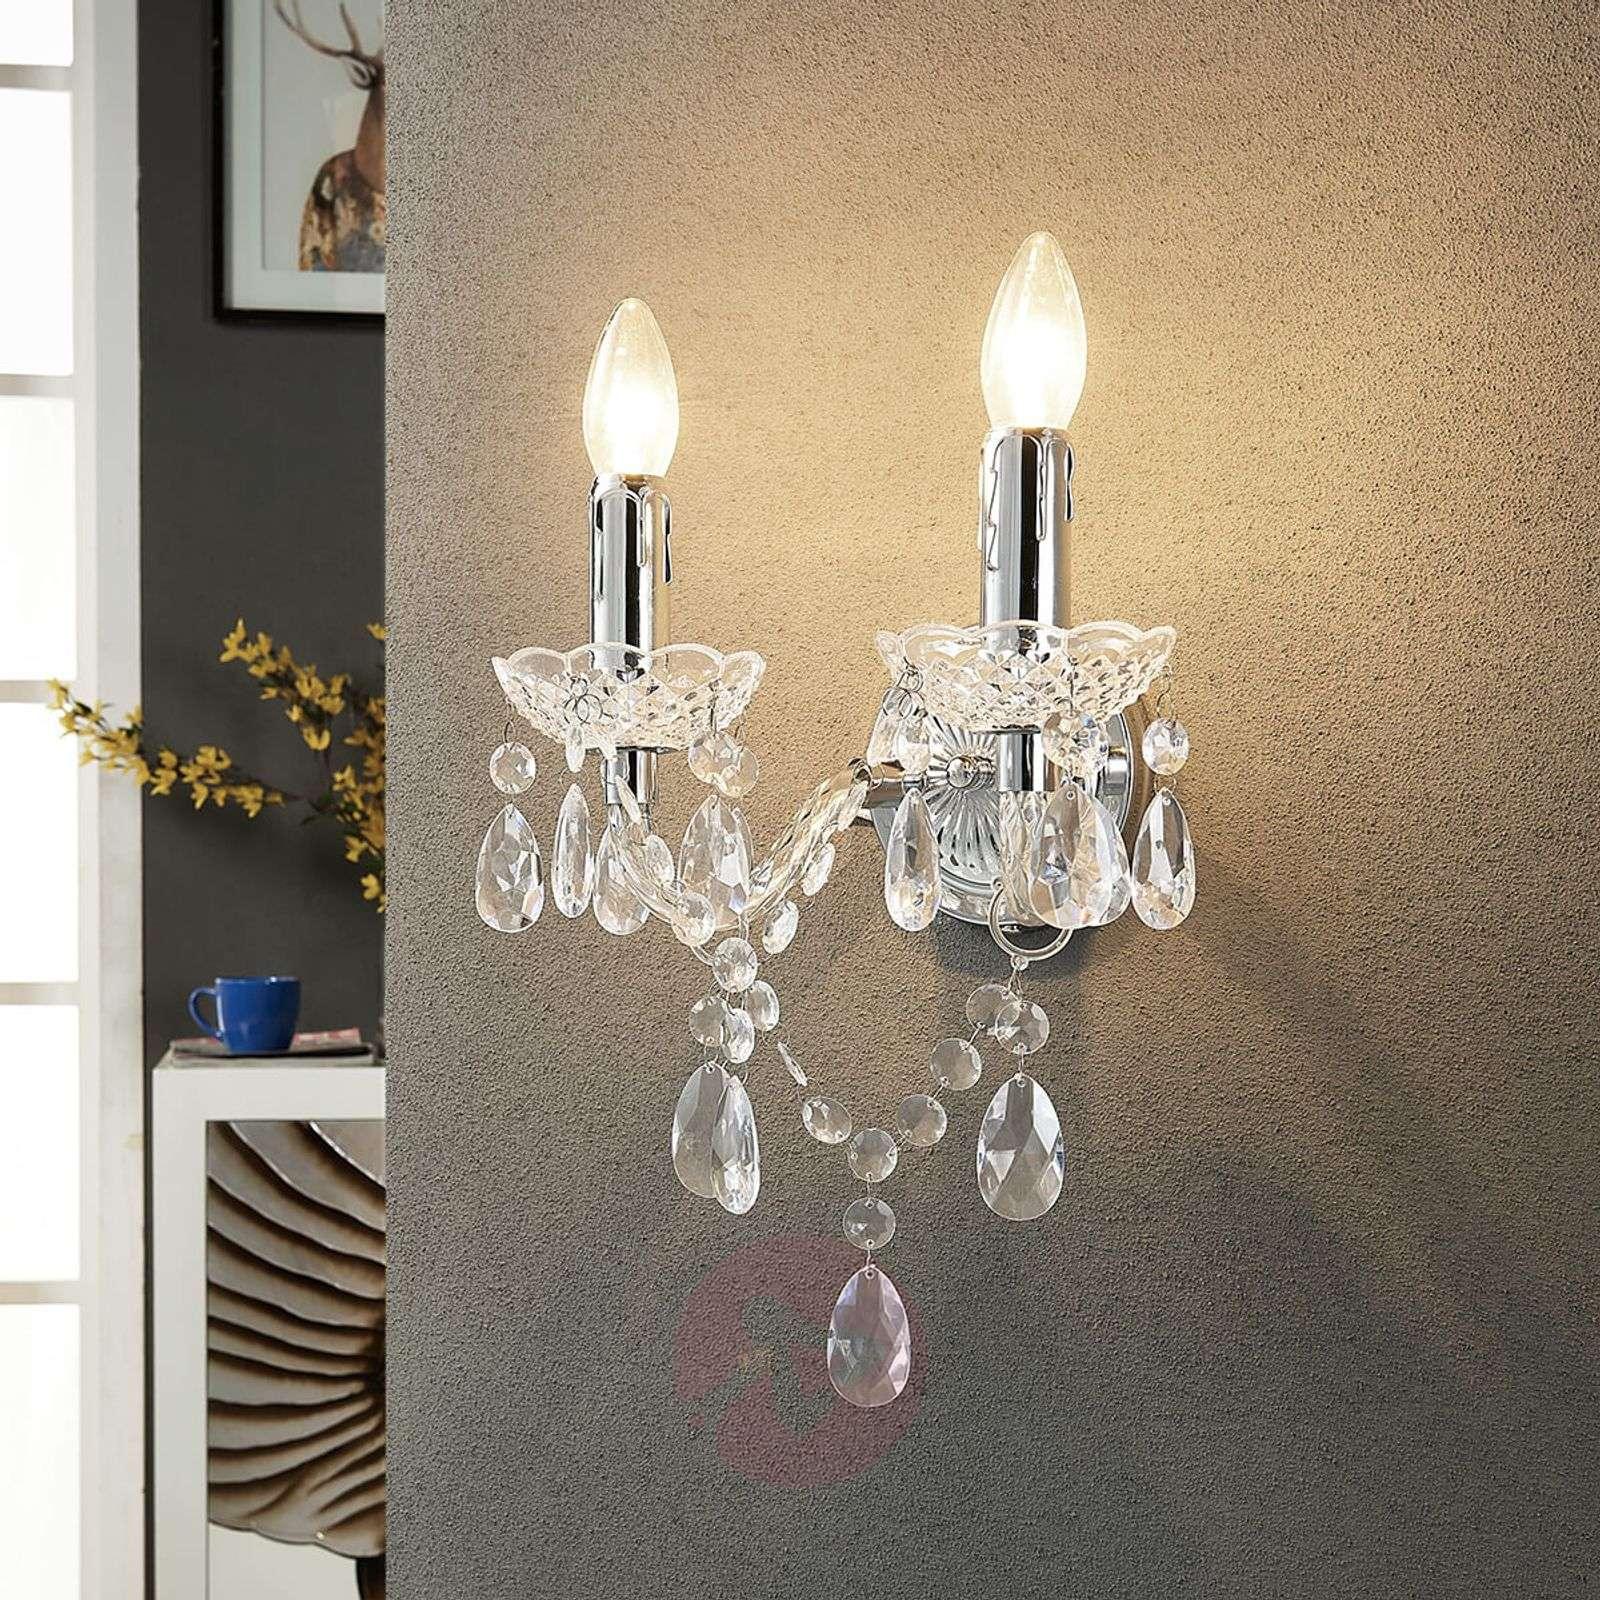 Merida elegant wall lamp, 2-bulb-9621172-02